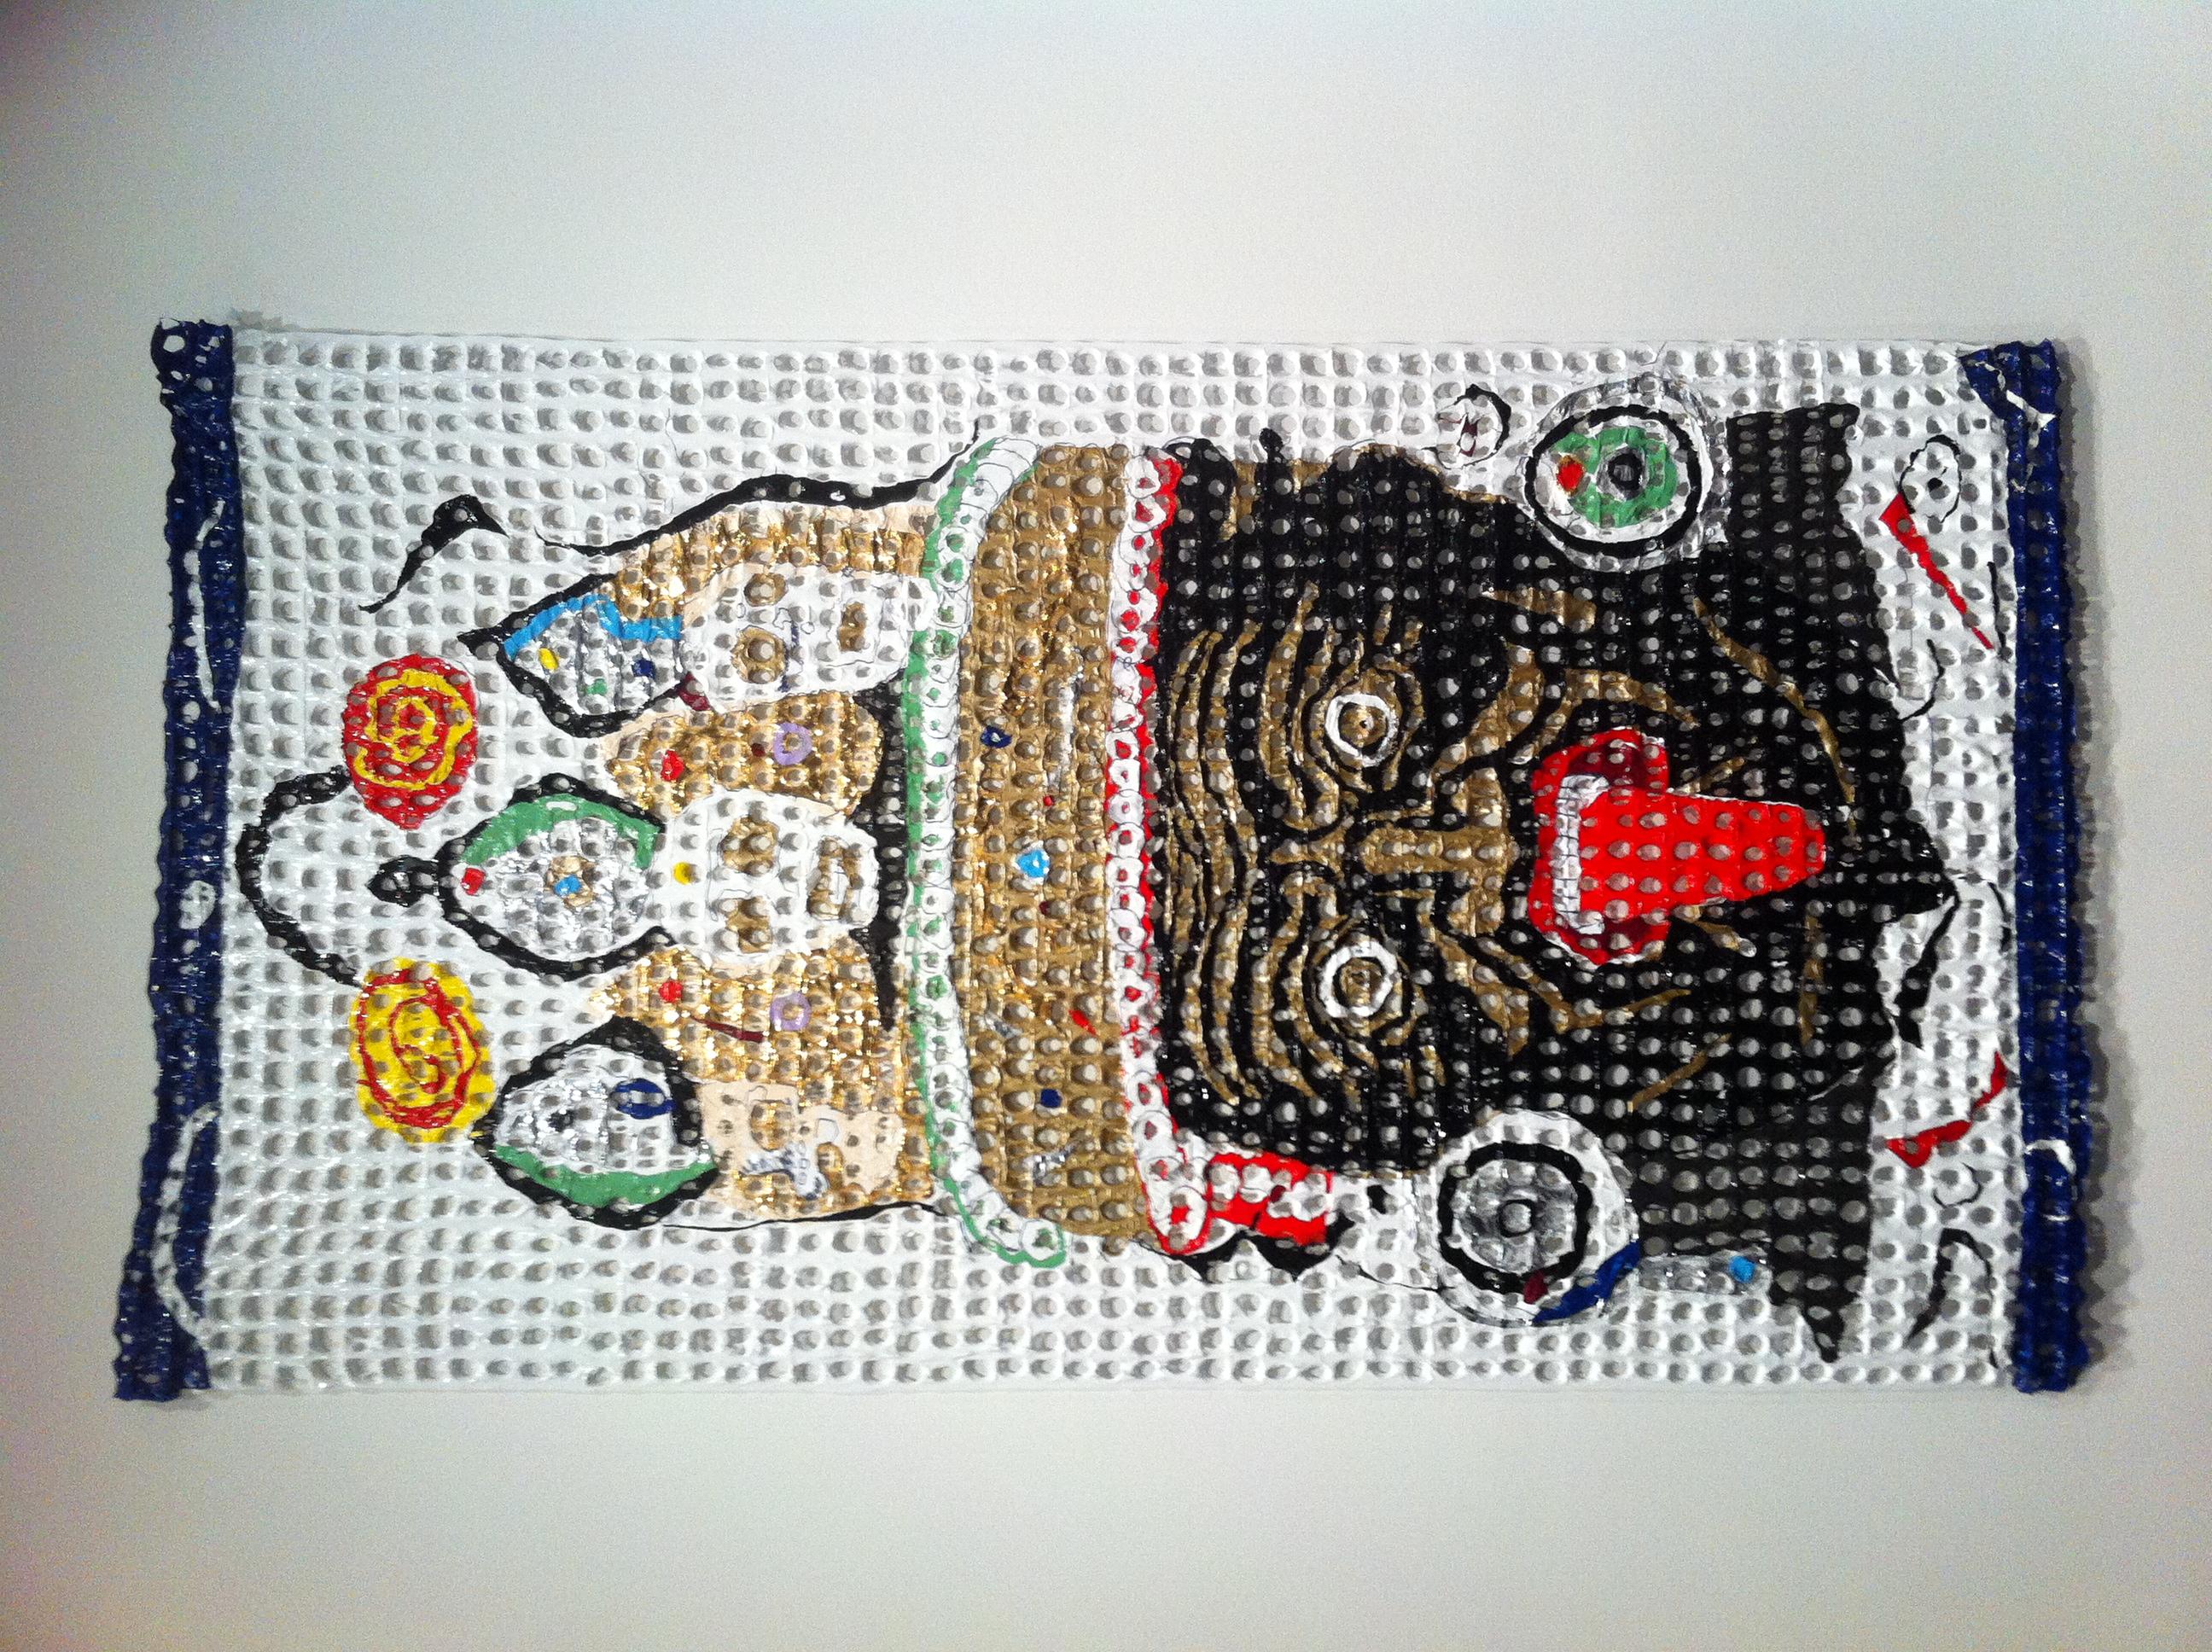 6. Kesang Lamdark, Dorge Drakkten and Kiss,  2012.Melted plastic, acrylic and metallic foil. CU Art Museum